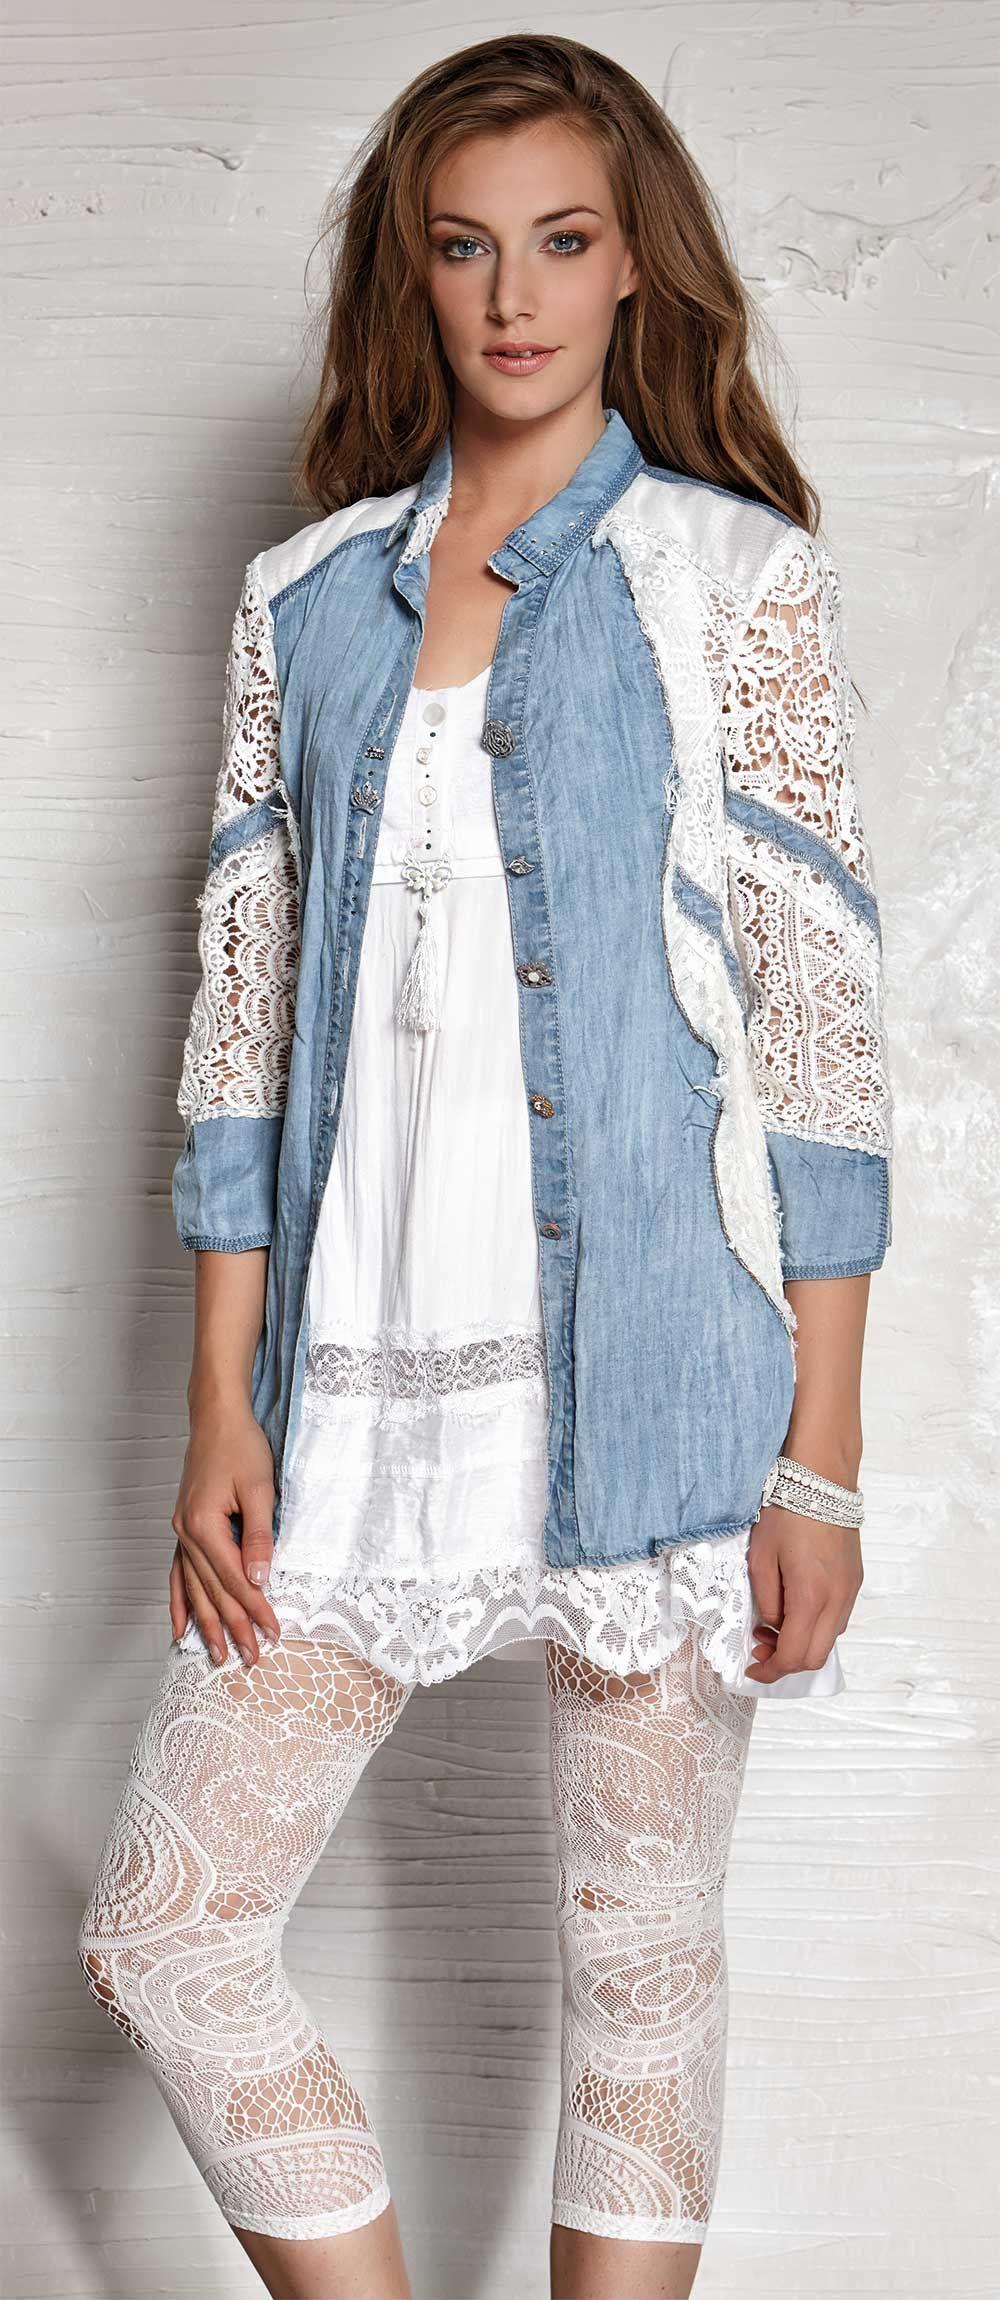 daniela dallavalle lookbook collection couture jeans com renda roupas tamanhos grandes et. Black Bedroom Furniture Sets. Home Design Ideas